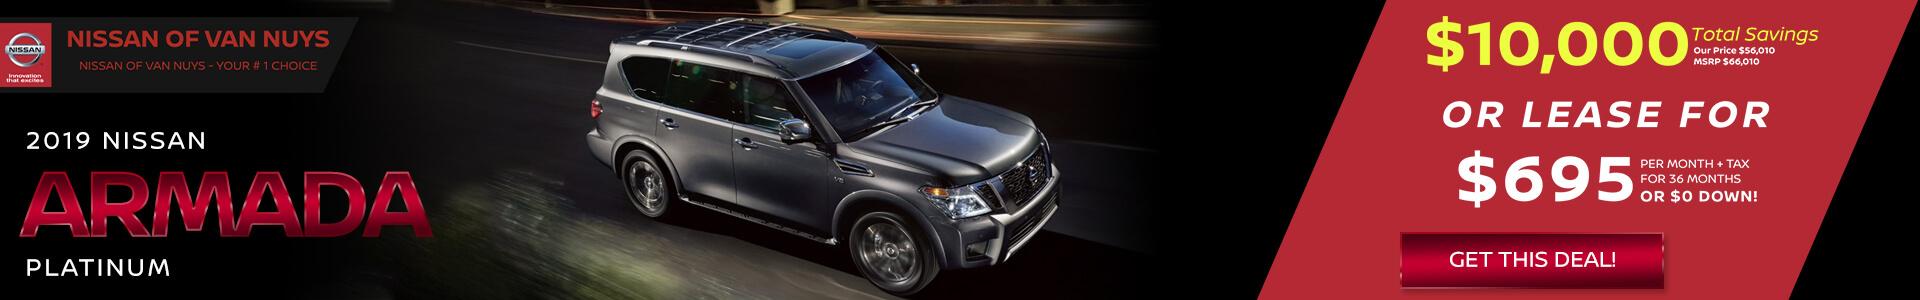 Nissan Armada - $56,010 Purchase